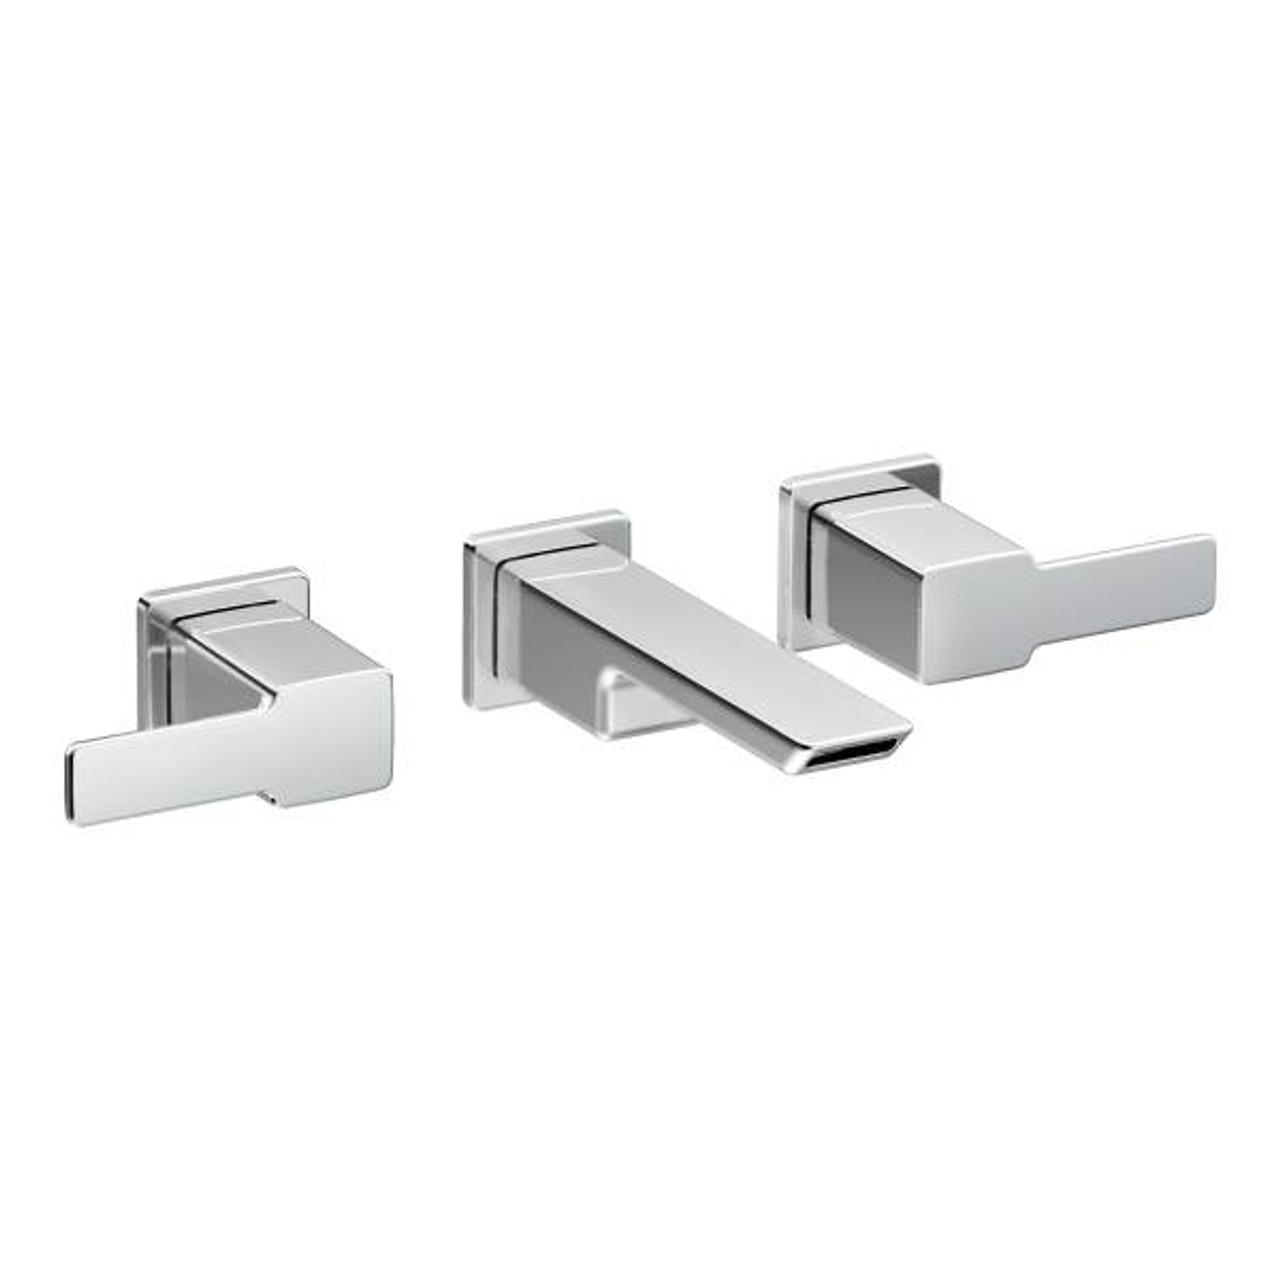 moen 90 degree two handle wall mount bathroom faucet